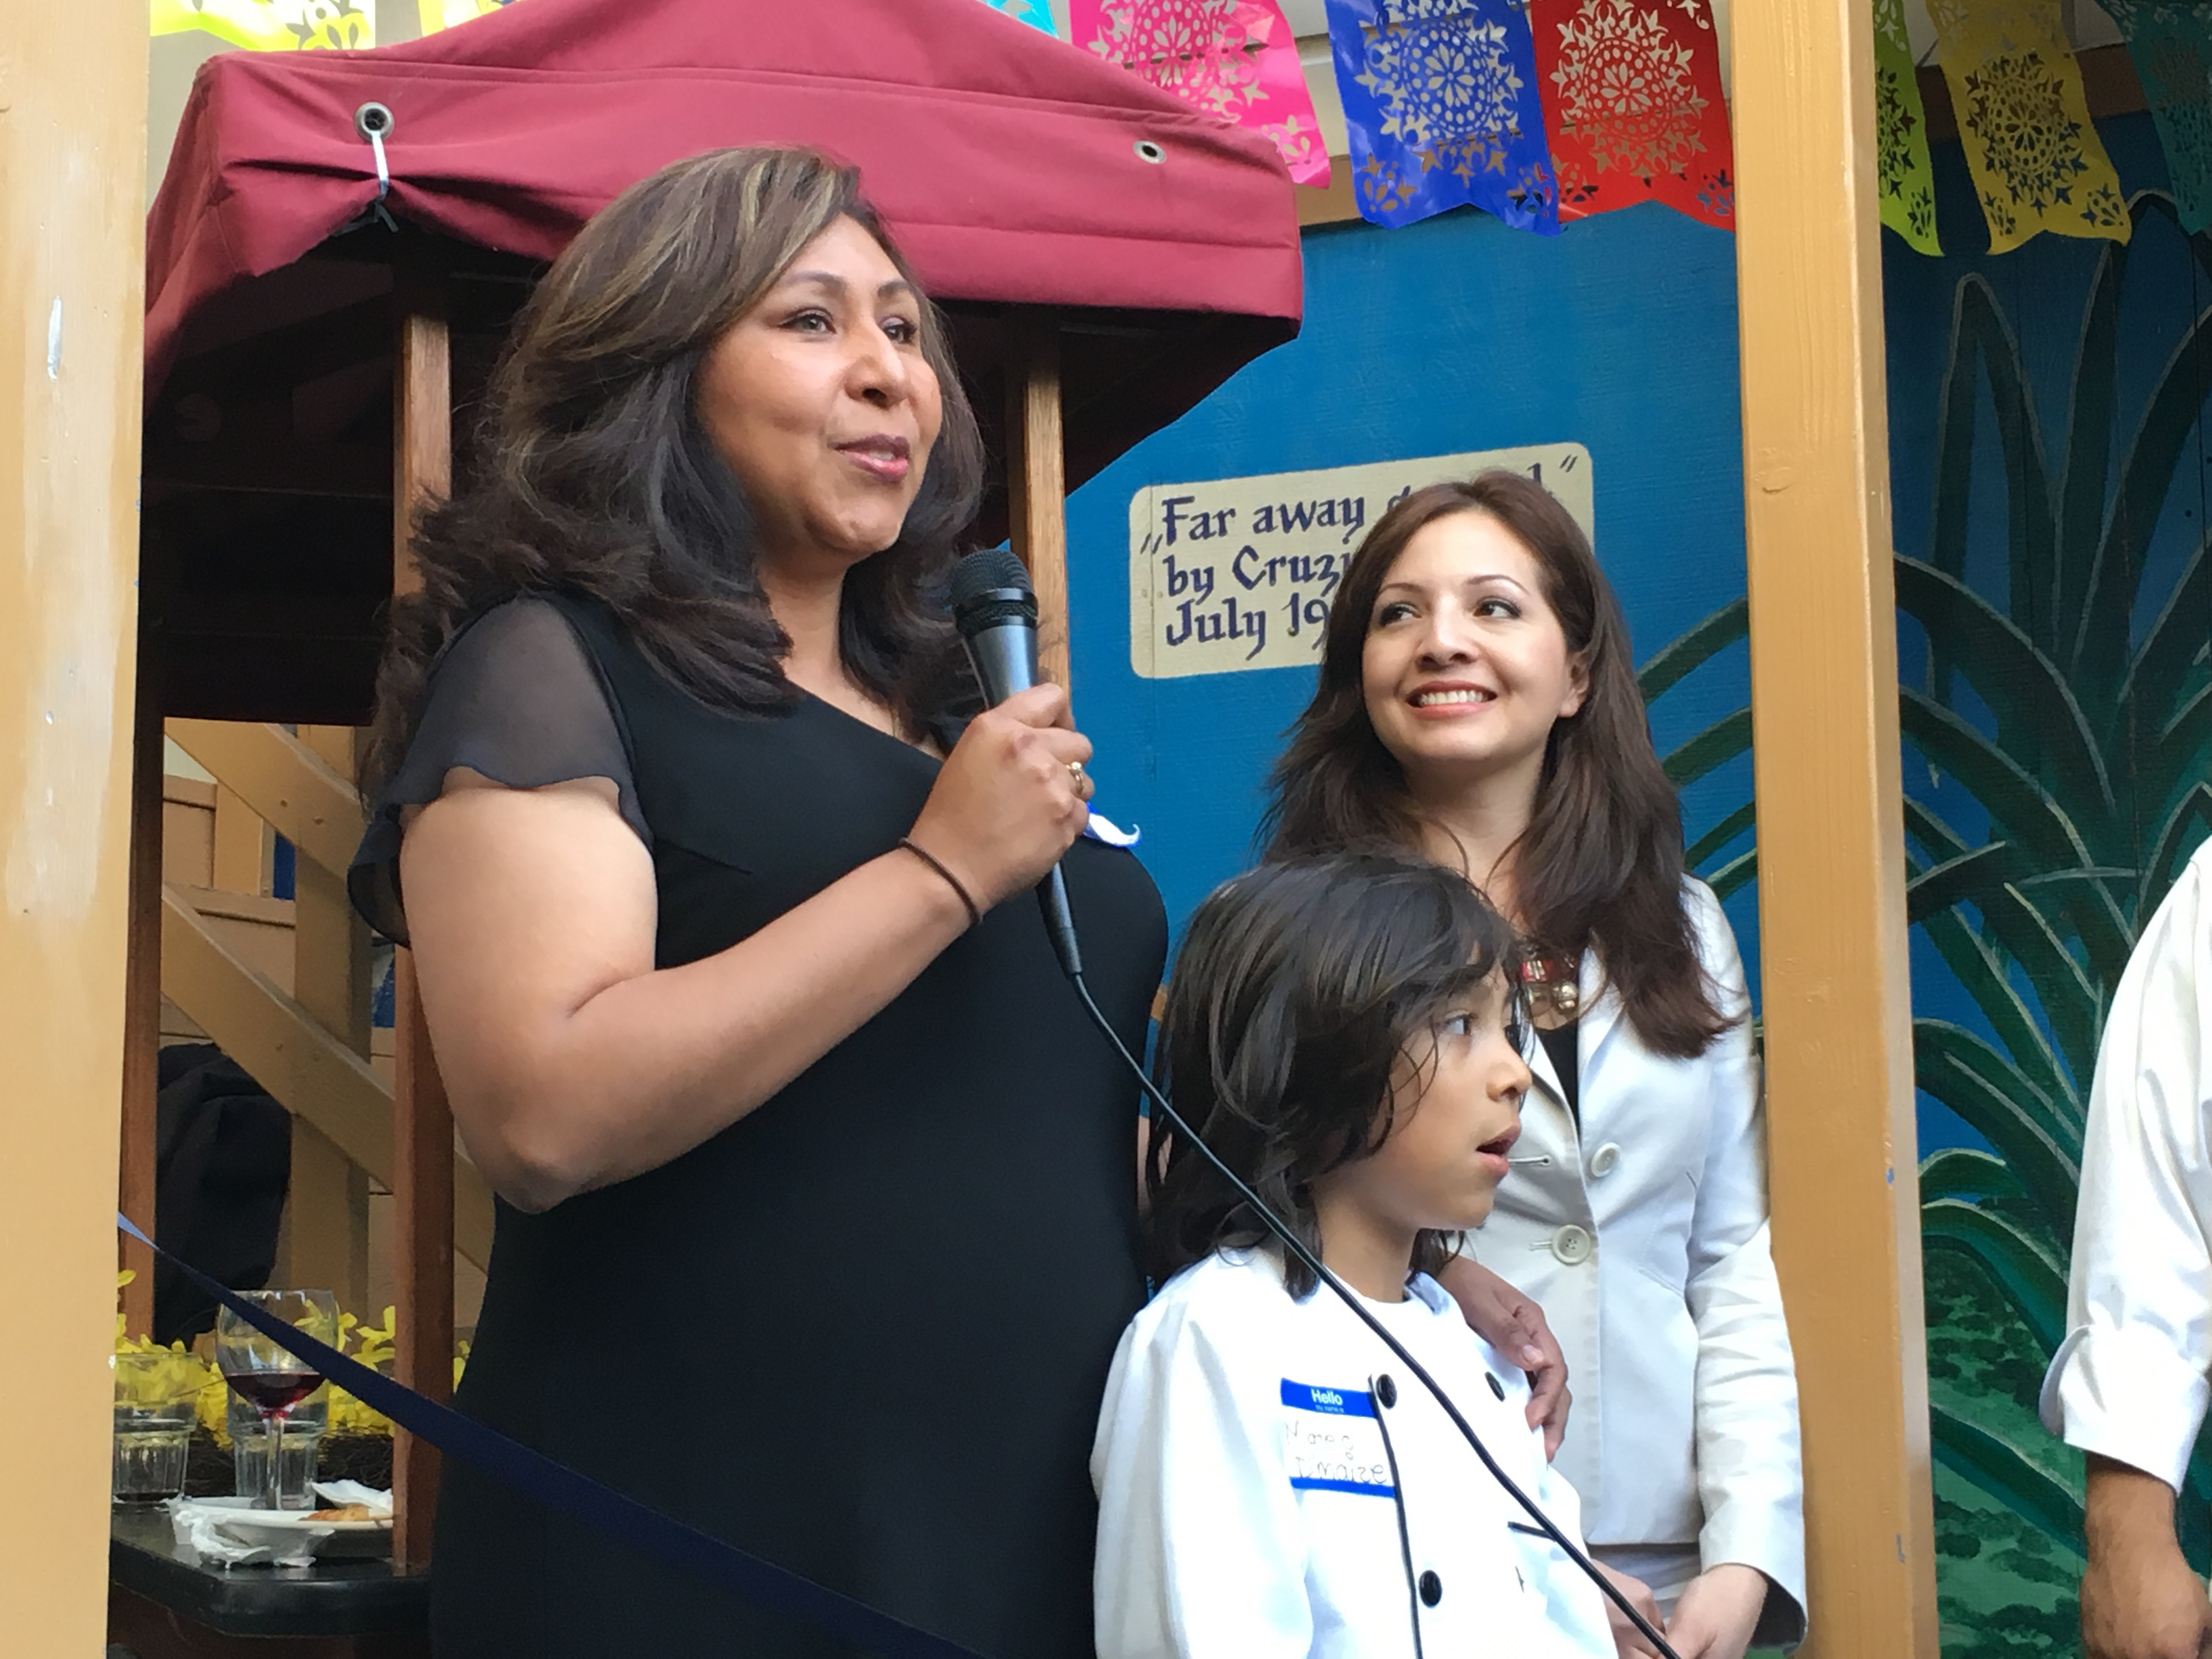 Zenaida Merlin at the grand opening of D'Maize on Thursday, May 12. Photo by Joe Rivano Barros.